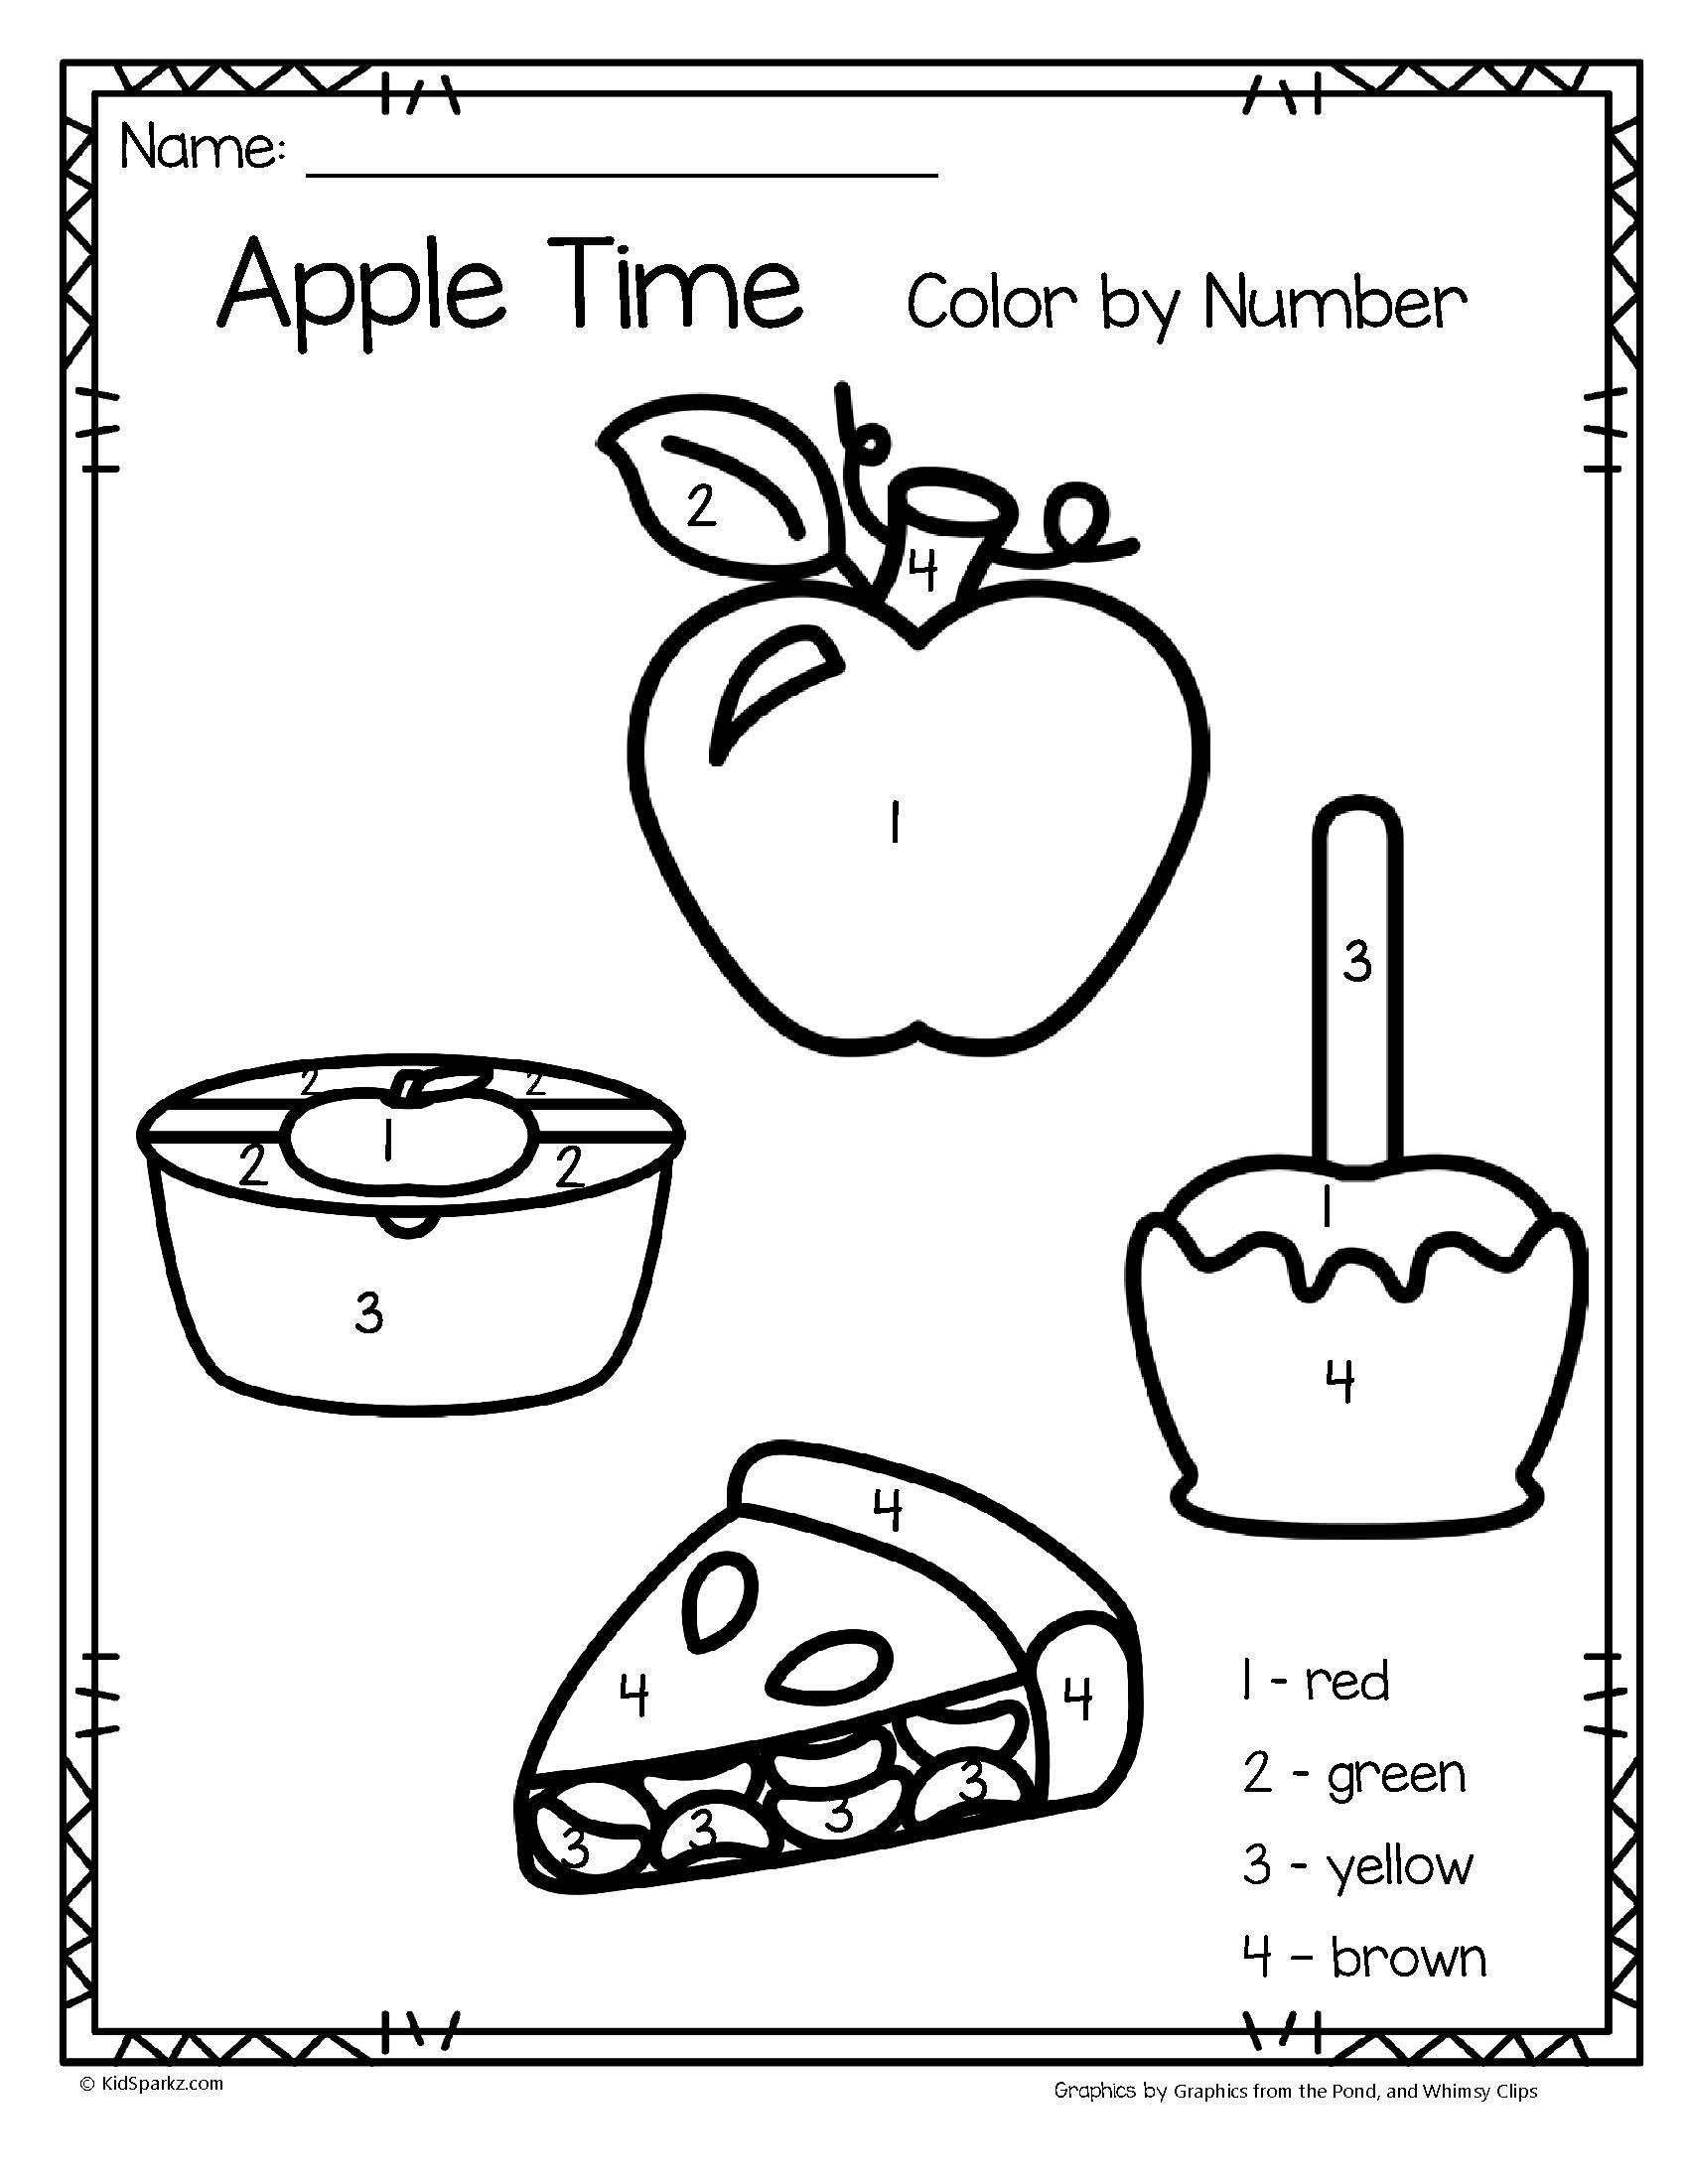 Free Apple Theme Color By Number Printables Colorbynumber Kind Kindergarten Worksheets Numbers Preschool Printables Kindergarten Worksheets Printable [ 2200 x 1700 Pixel ]